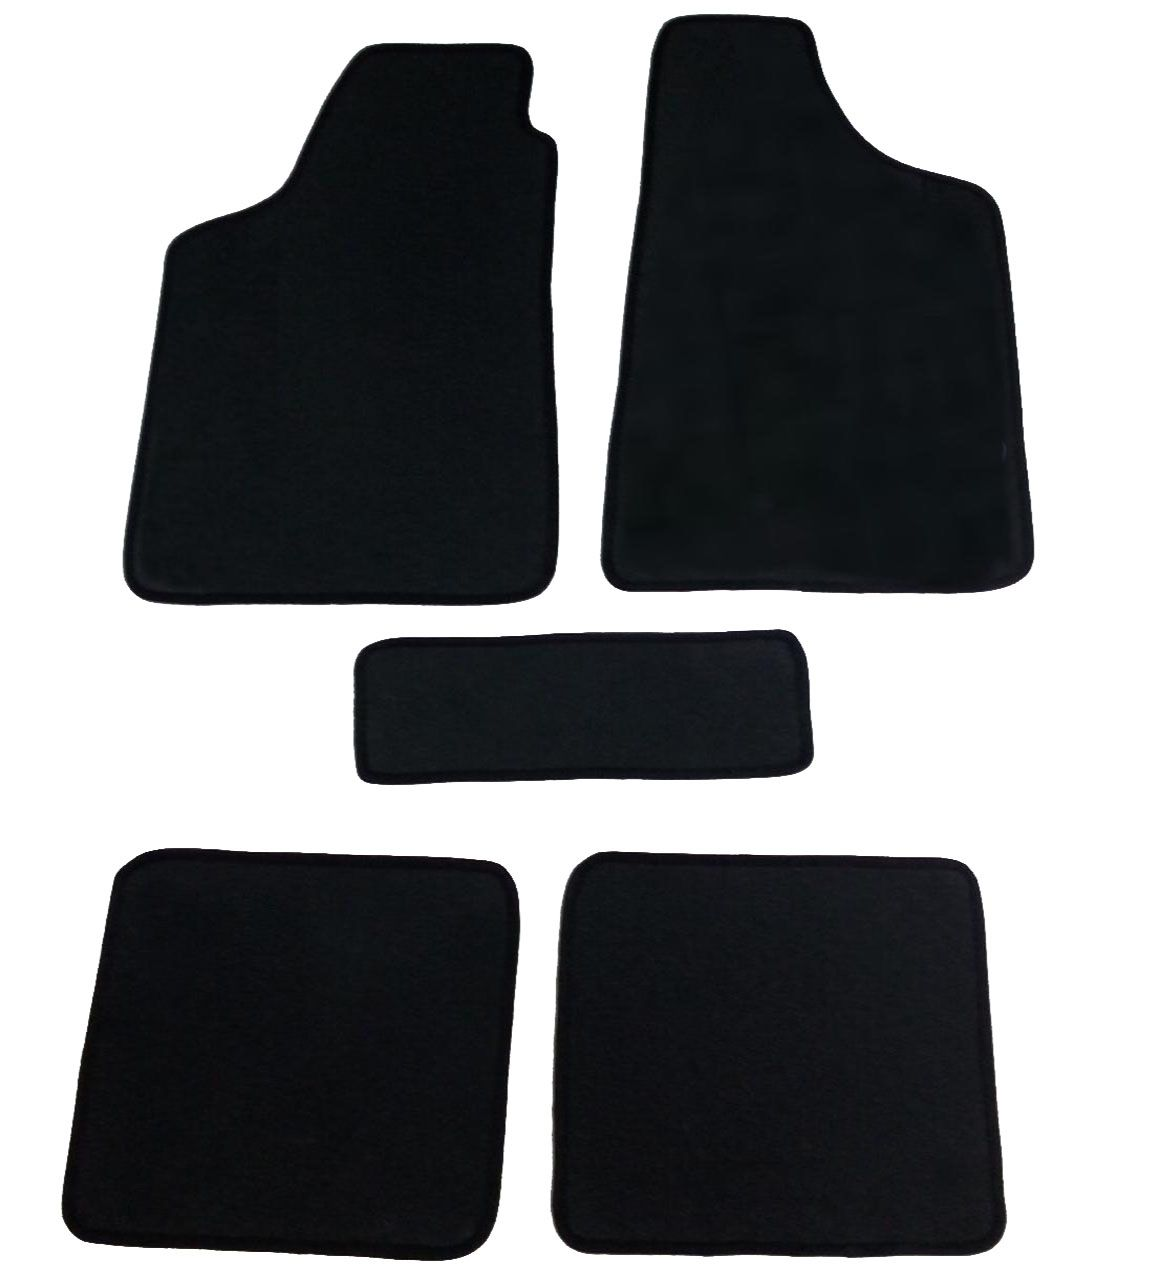 Tapete Fiat Tempra Carpete Exclusiv Base Pinada